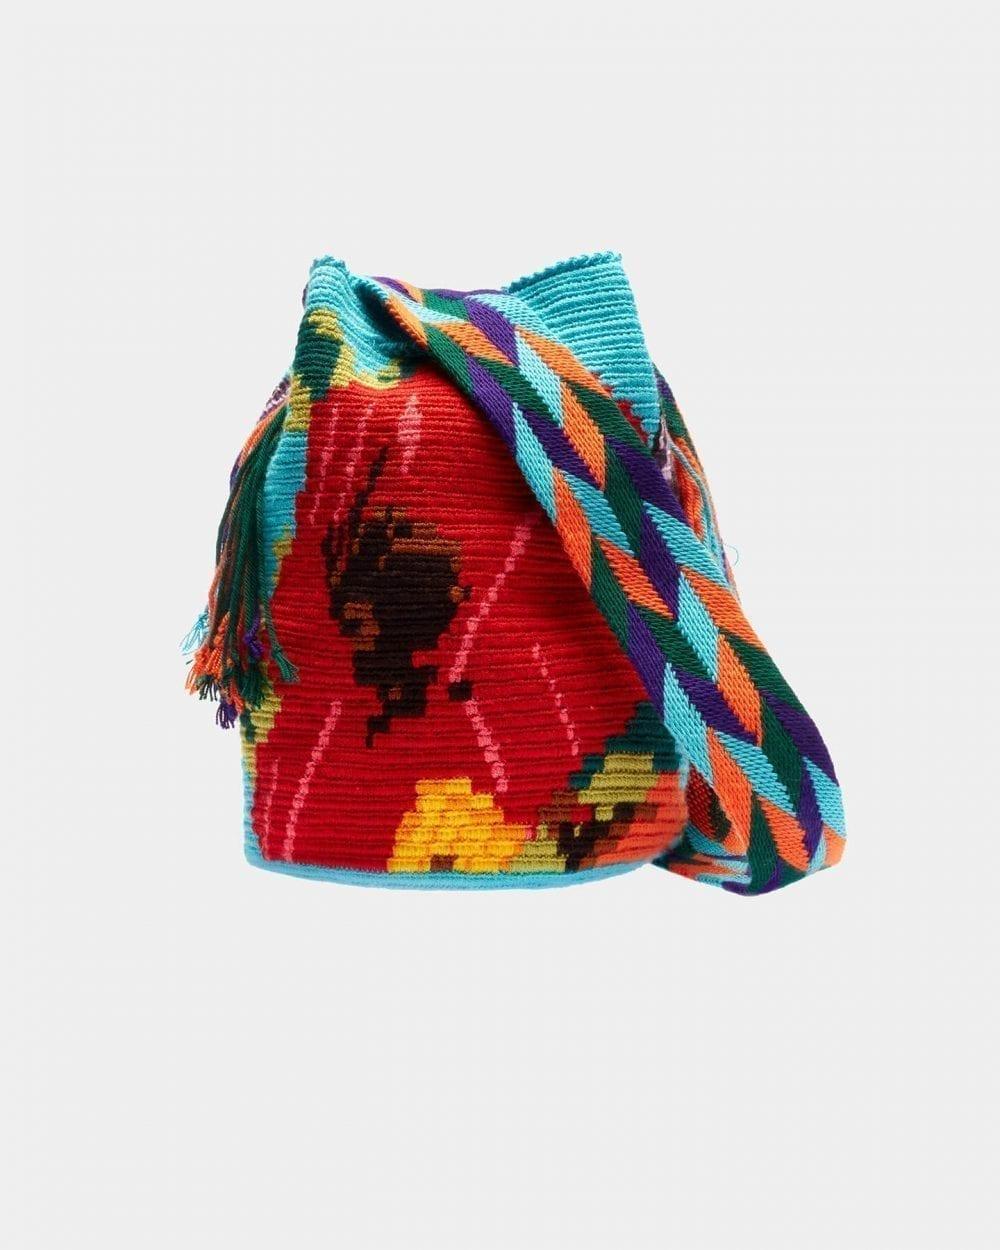 Lea Flower shoulder bag by ALLBYB Design, Philadelphia